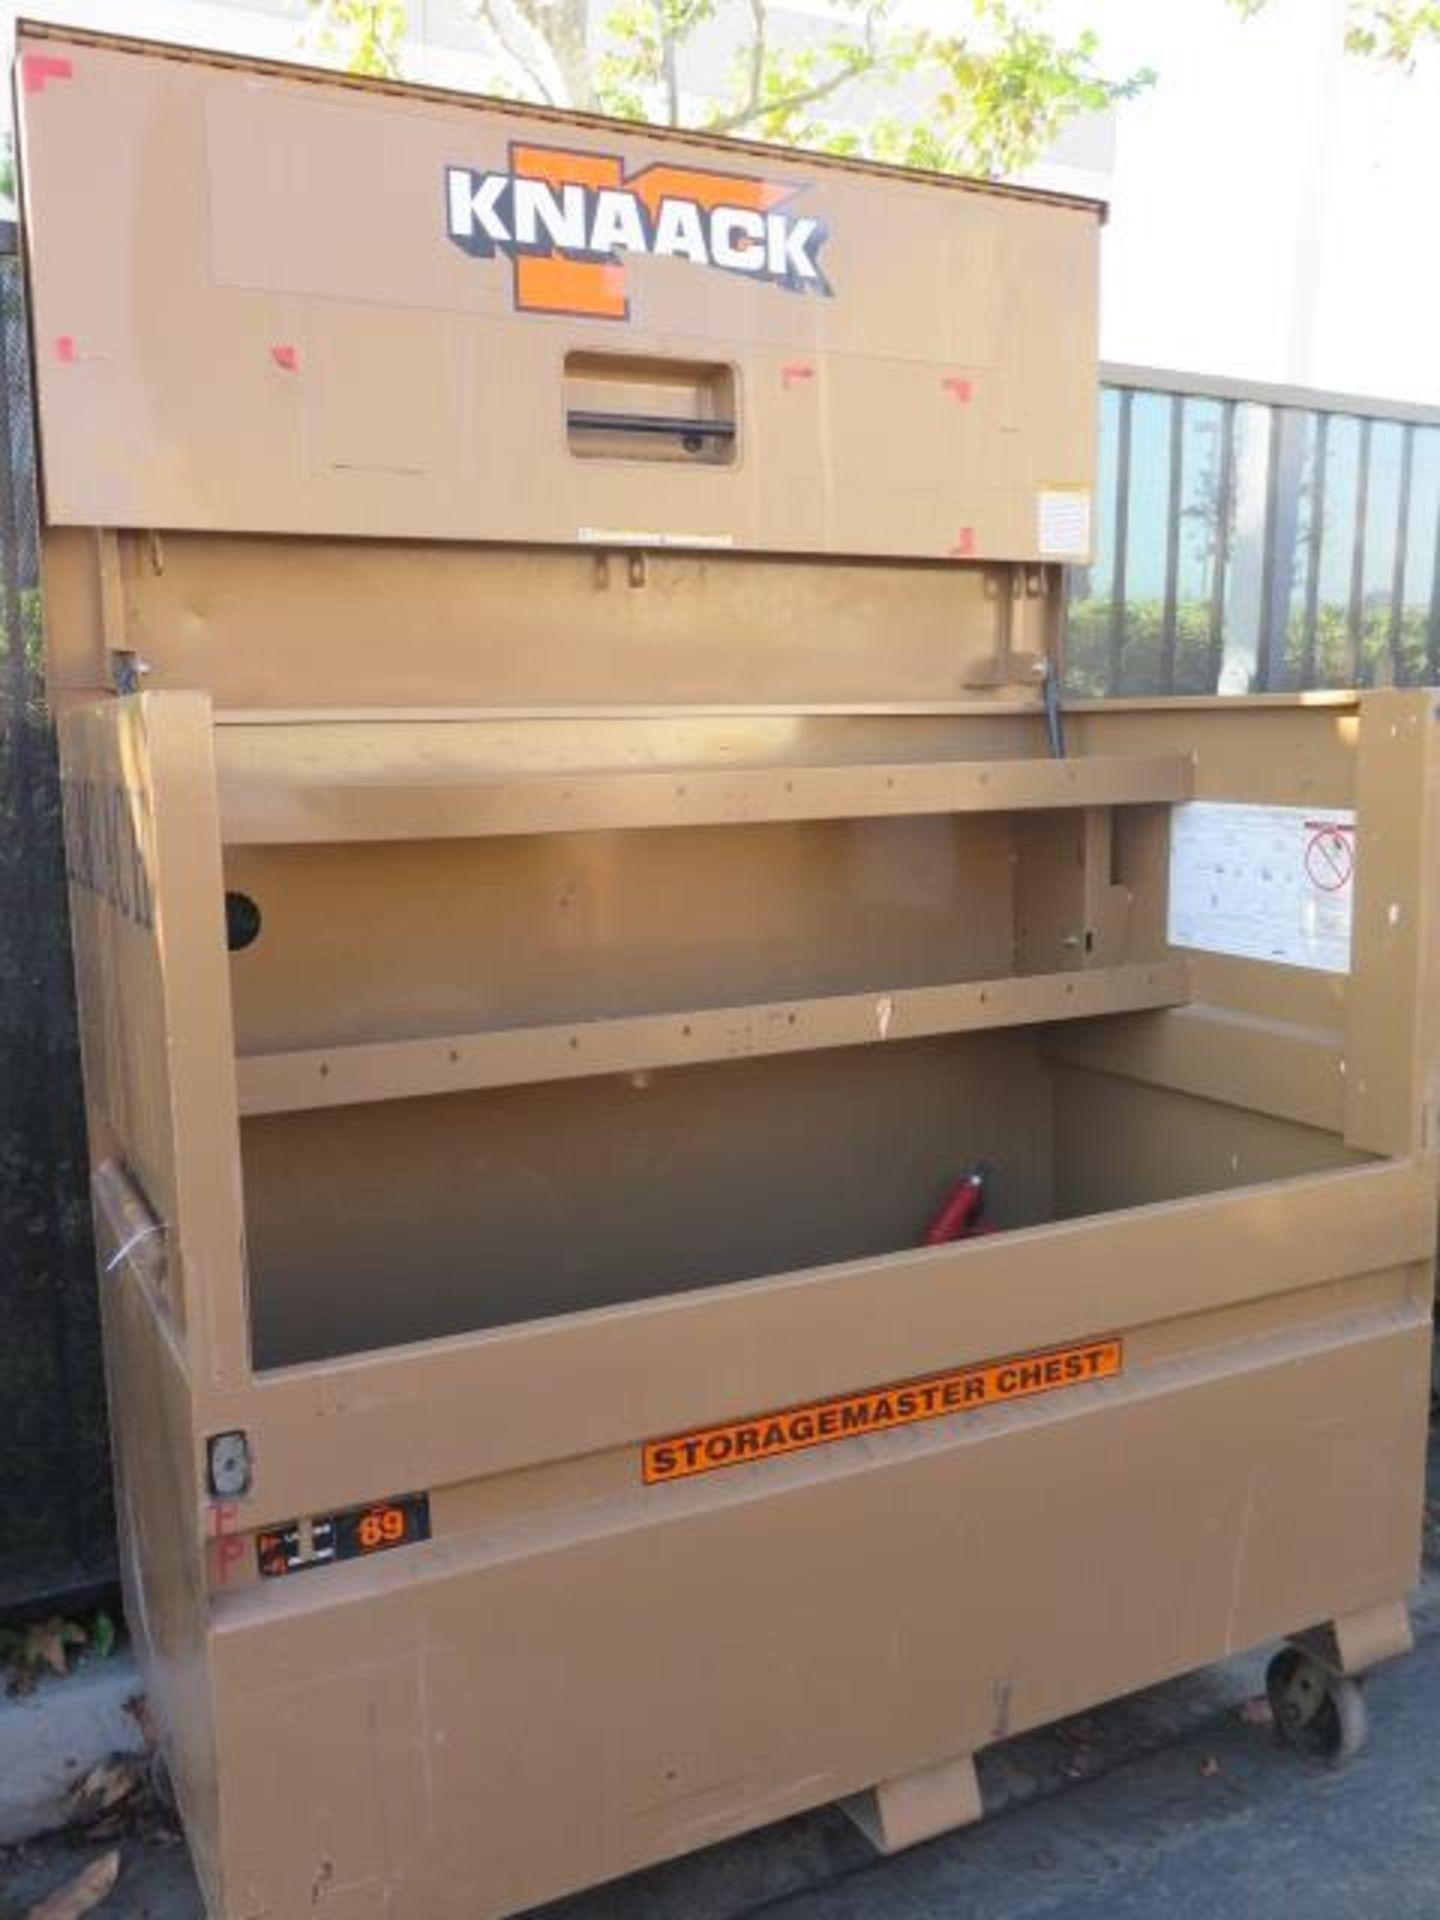 Knaack mdl. 89 Storagemaster Rolling Job Box w/ Ridgid Tri-Stands (SOLD AS-IS - NO WARRANTY) - Image 4 of 11